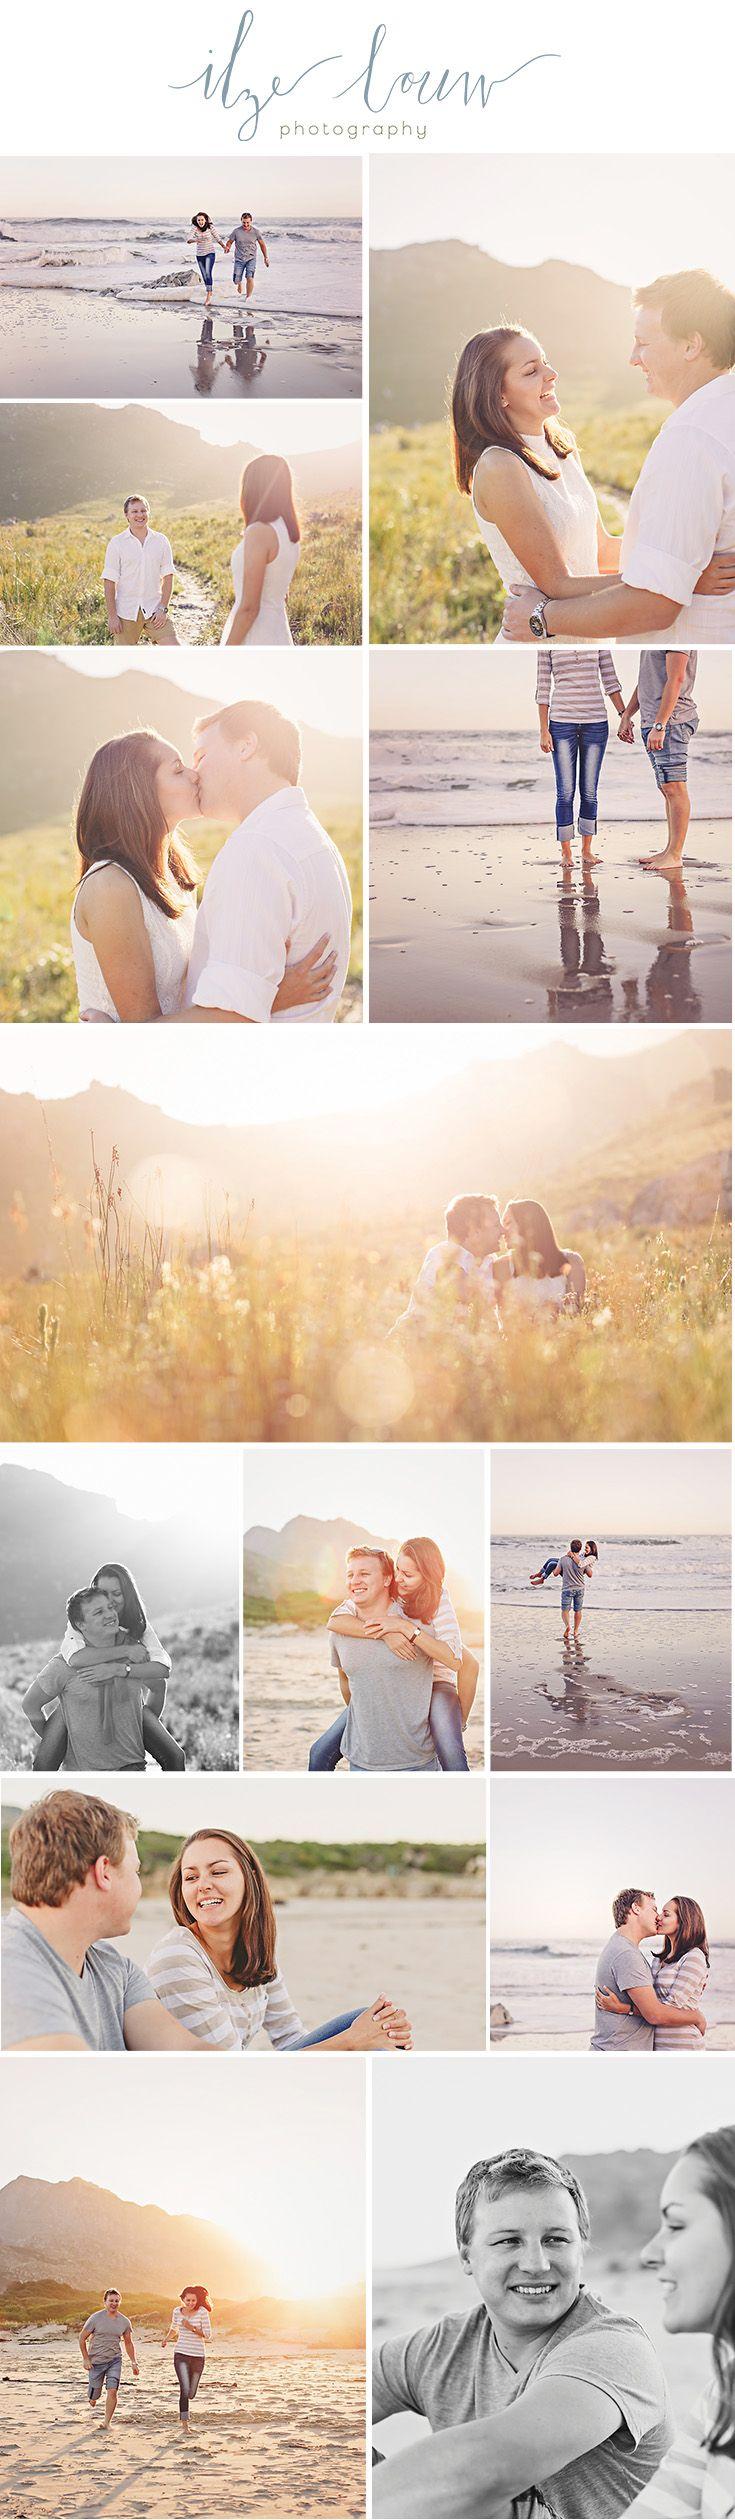 www.ilzelouw.co.za Lifestyle Couple Photographer, Overberg Photographer, Western Cape, South Africa #lifestyle #couple #photography #nature #sunset #sea #beach #photos